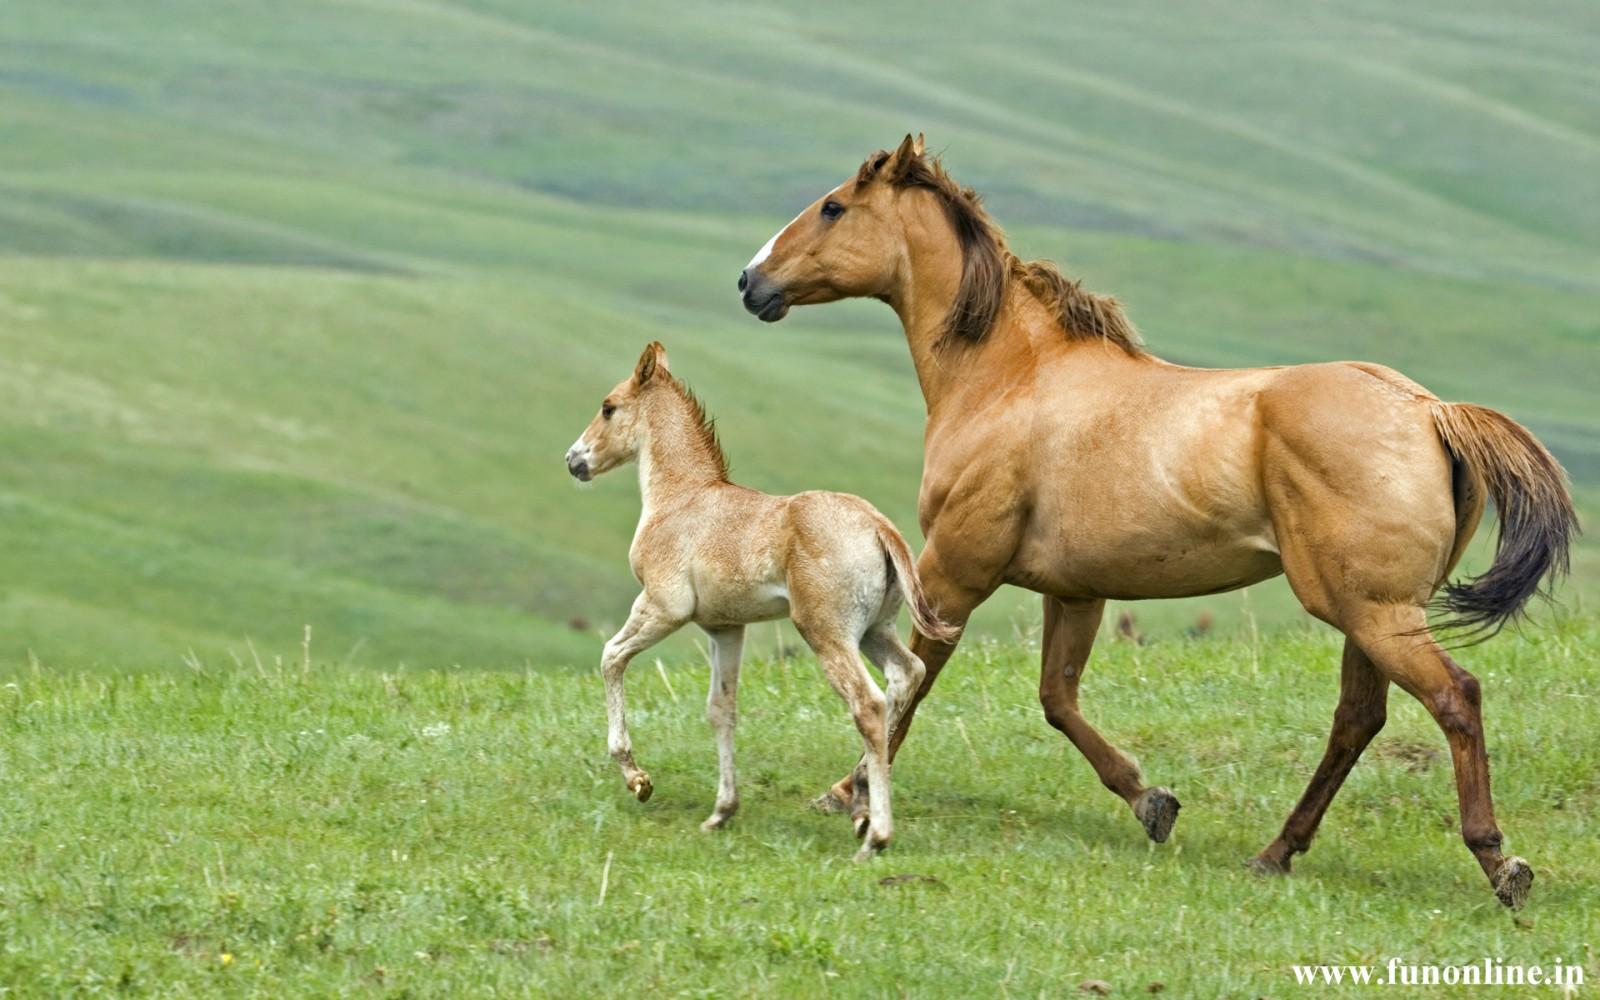 Wild Horses Wallpapers Wallpaper